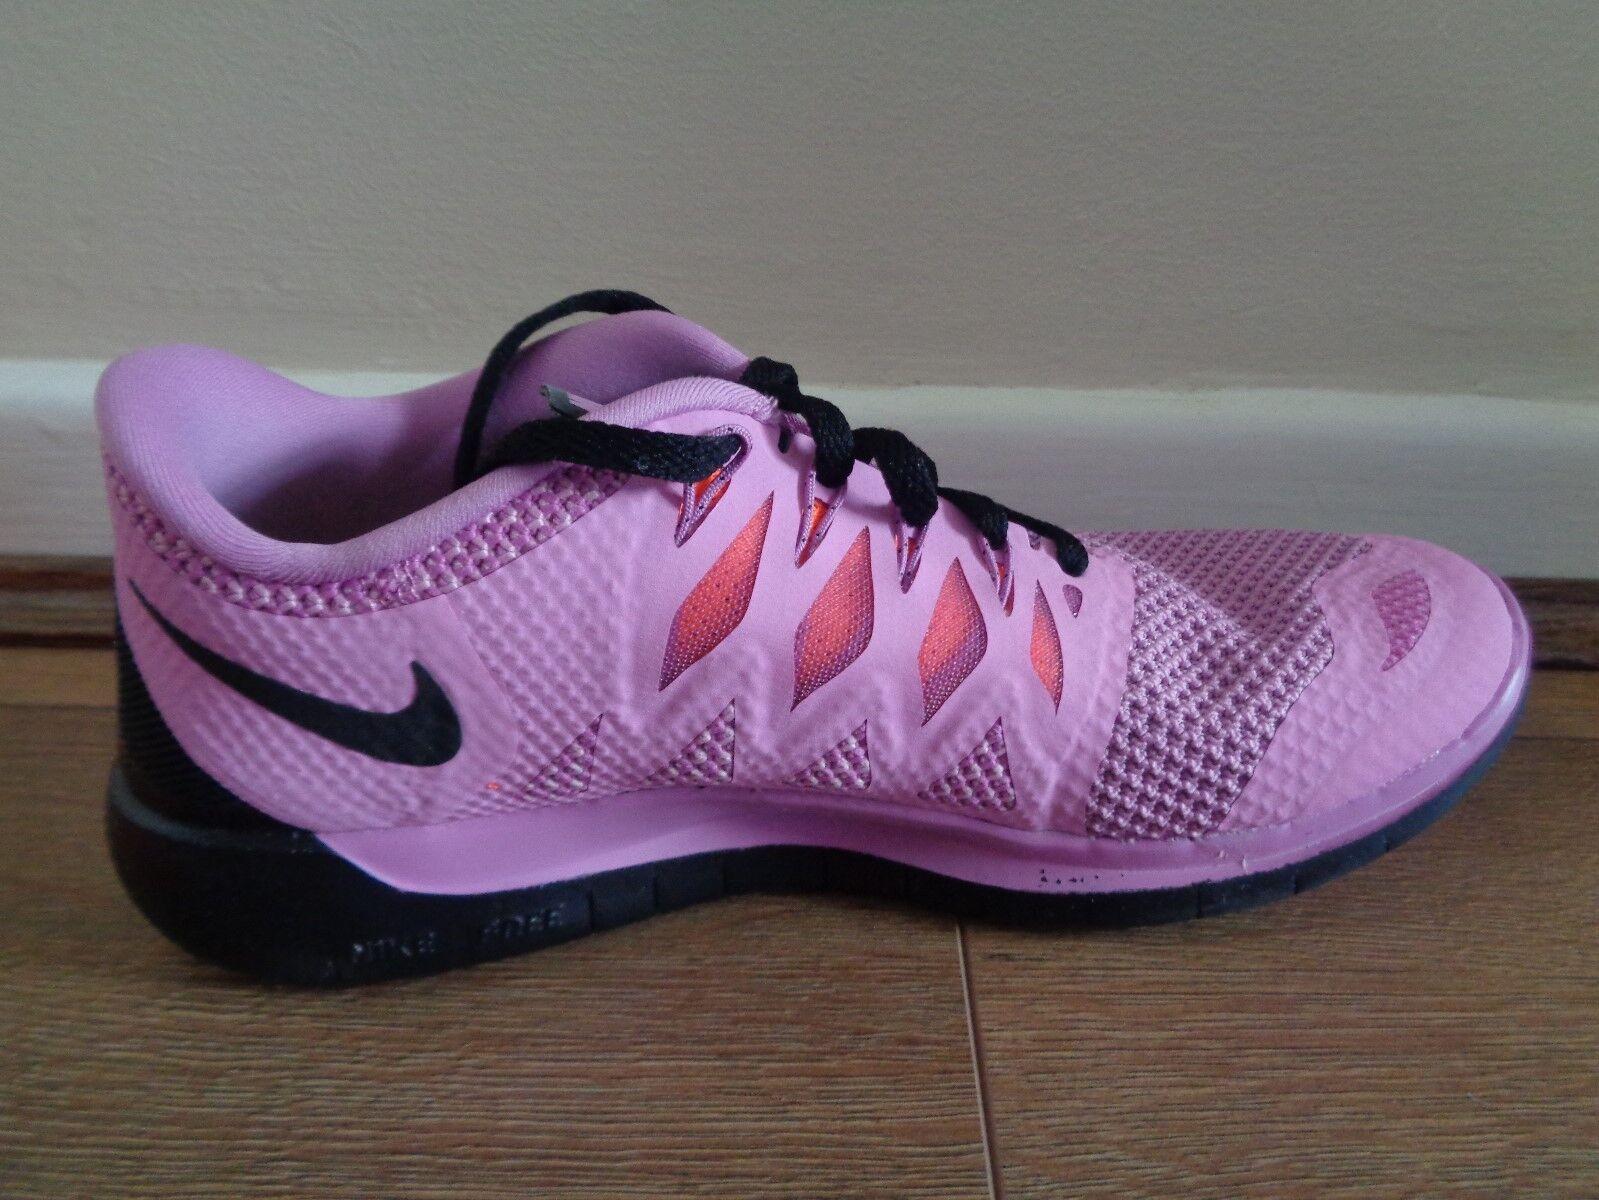 Nike Free 5.0 Linea Donna Scarpe Da Corsa Corsa Corsa Scarpe da ginnastica 642199 503 EU 38.5 US 7.5 NUOVE 323568